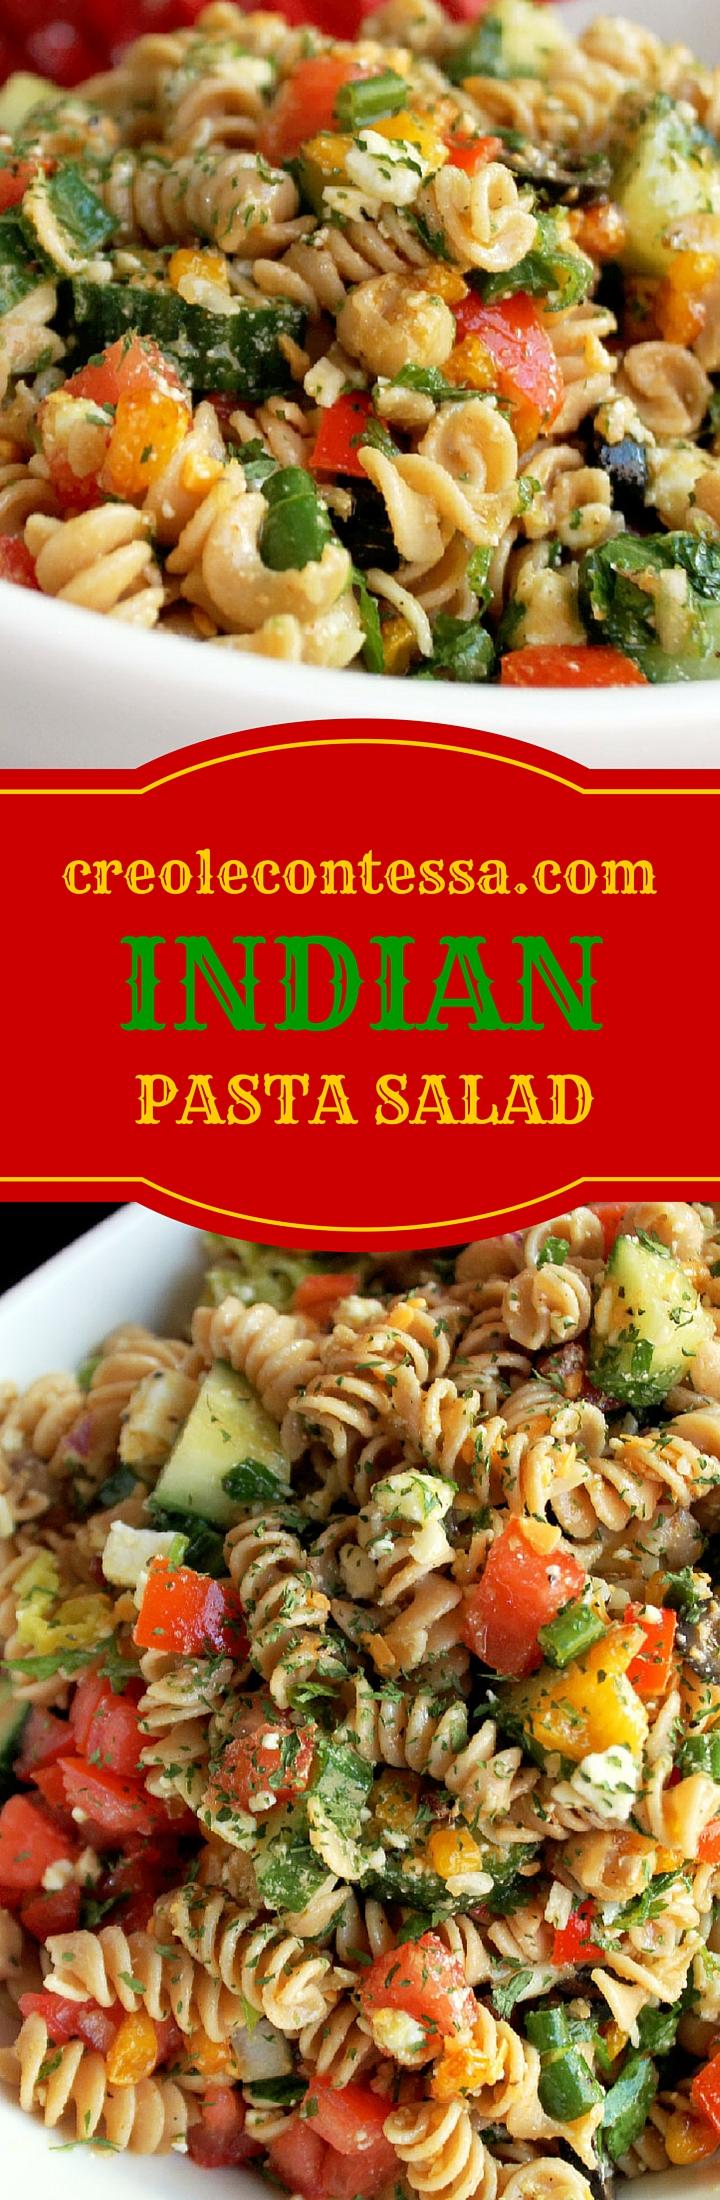 Indian Pasta Salad-Creole Contessa